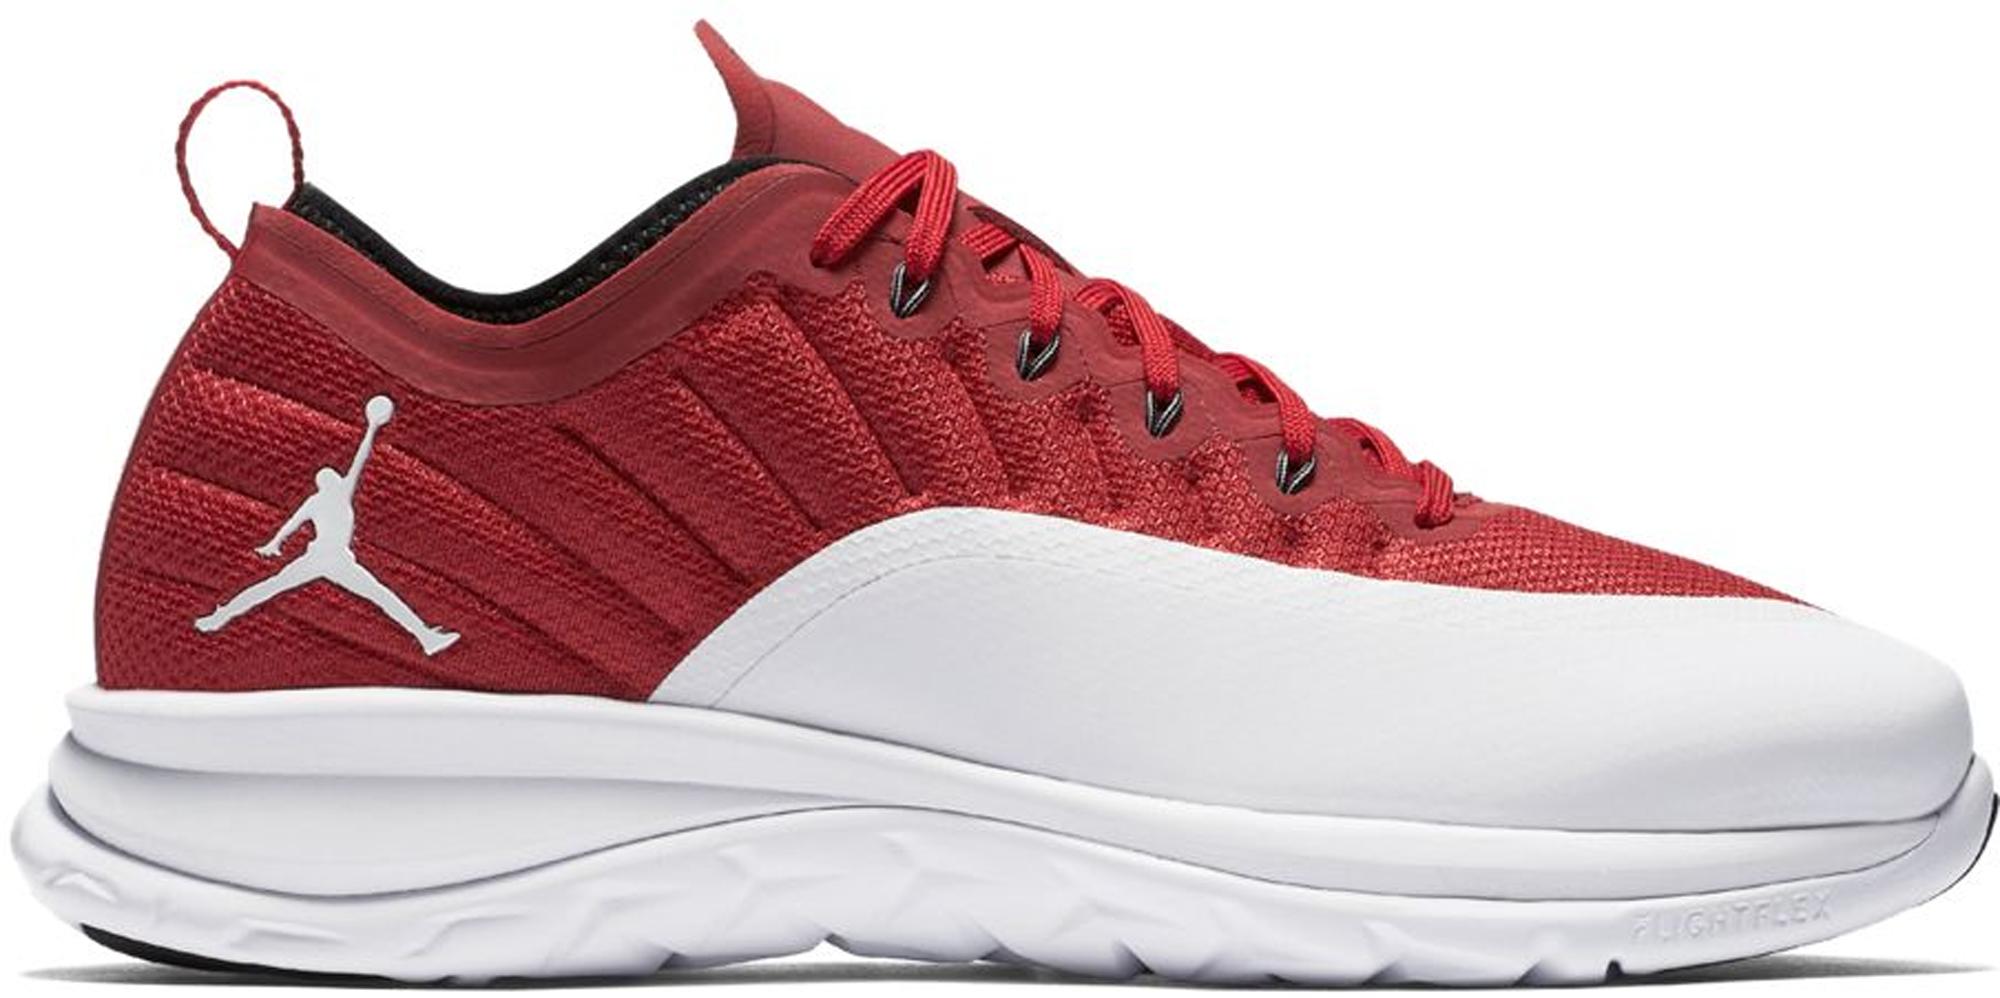 Jordan Trainer Prime Gym Red - 881463-601